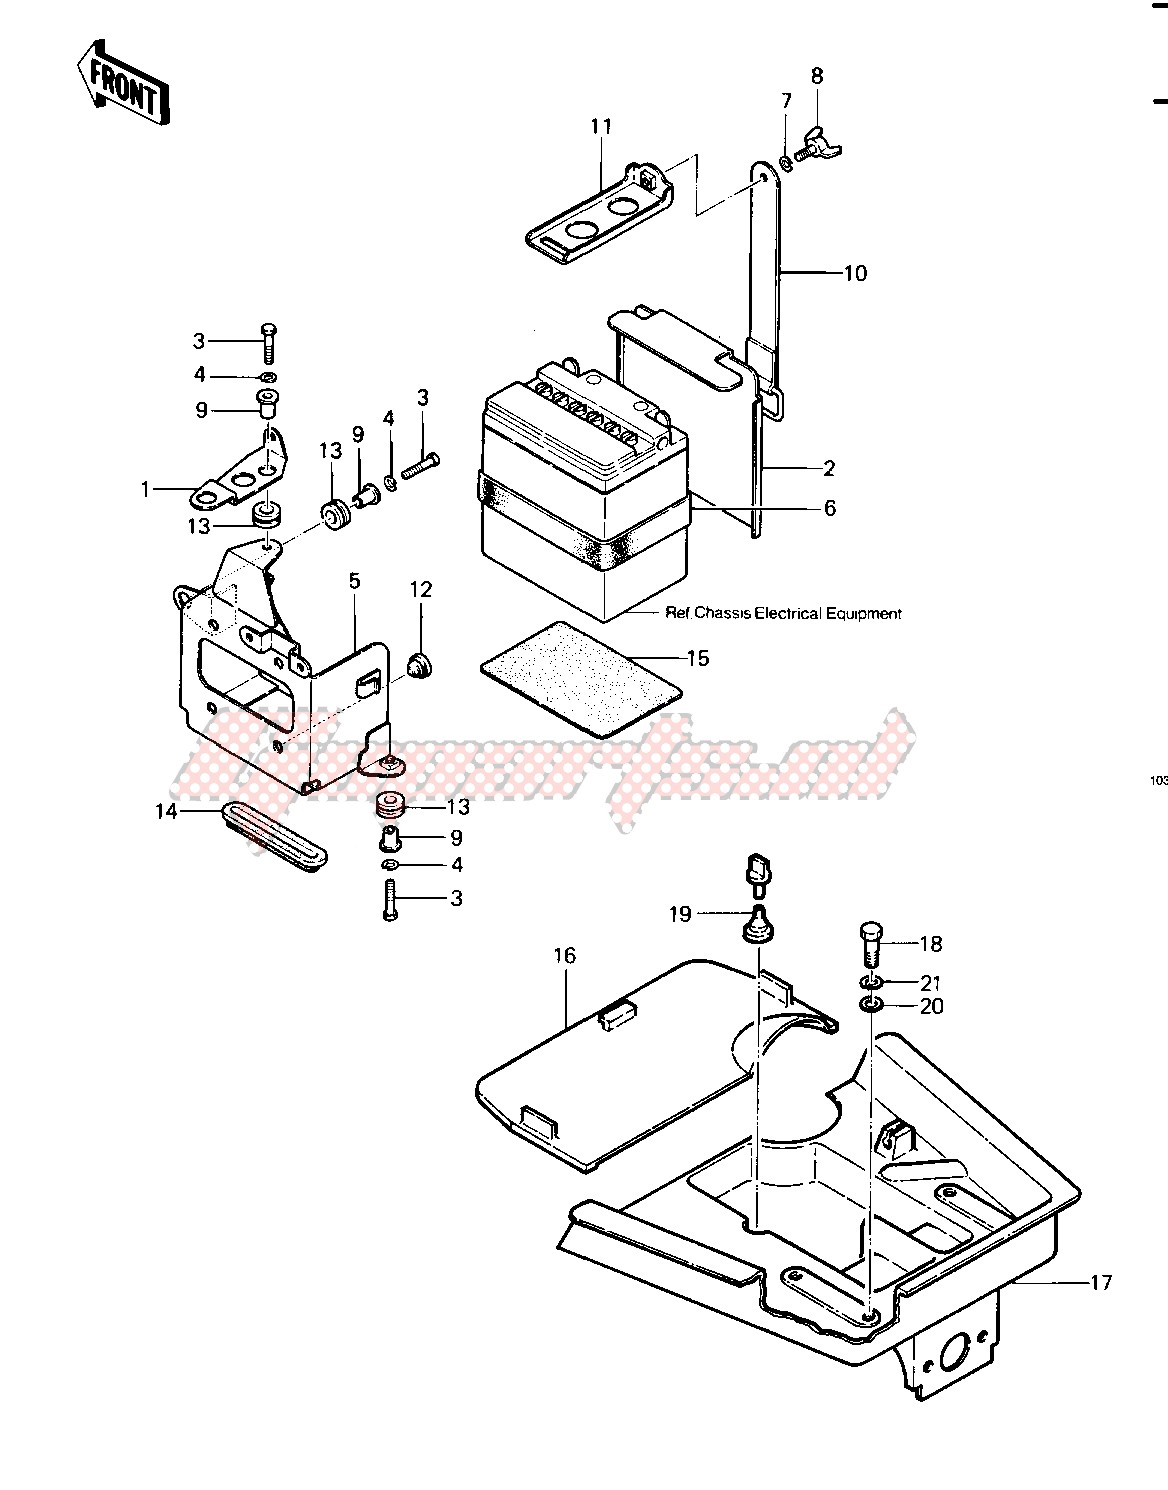 BATTERY CASE_TOOL CASE -- 83 KLT200-C1- - image